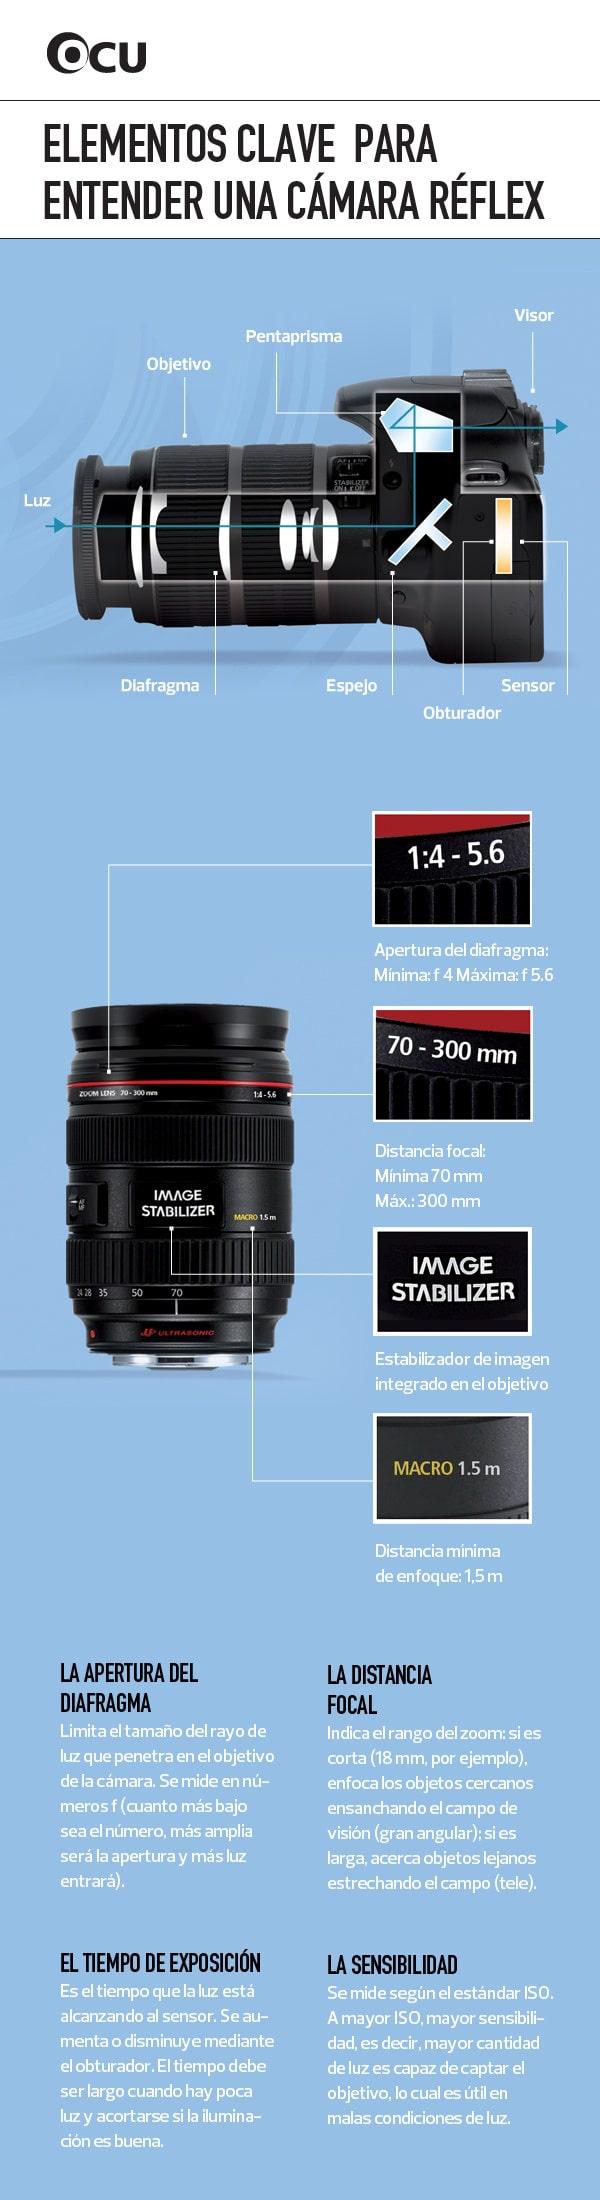 infografia camara reflex